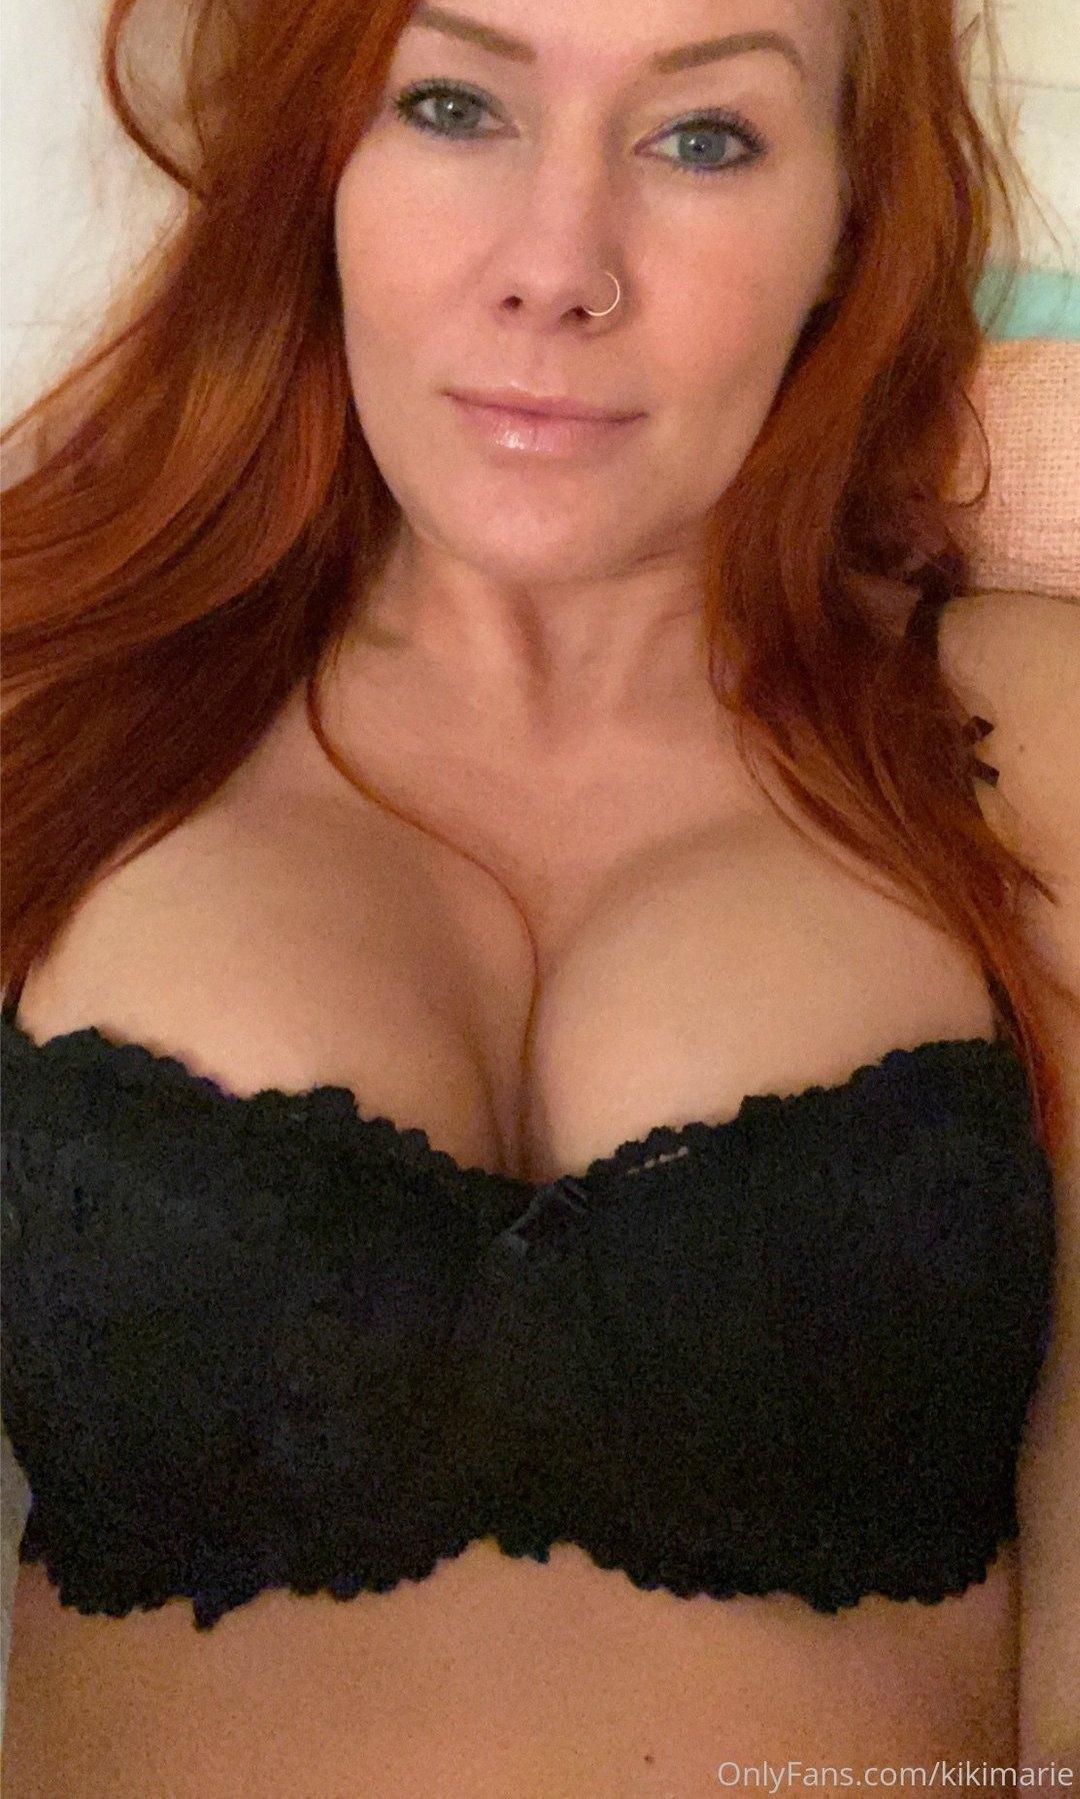 Kiki Marie Kikimarie Onlyfans Nudes Leaks 0037